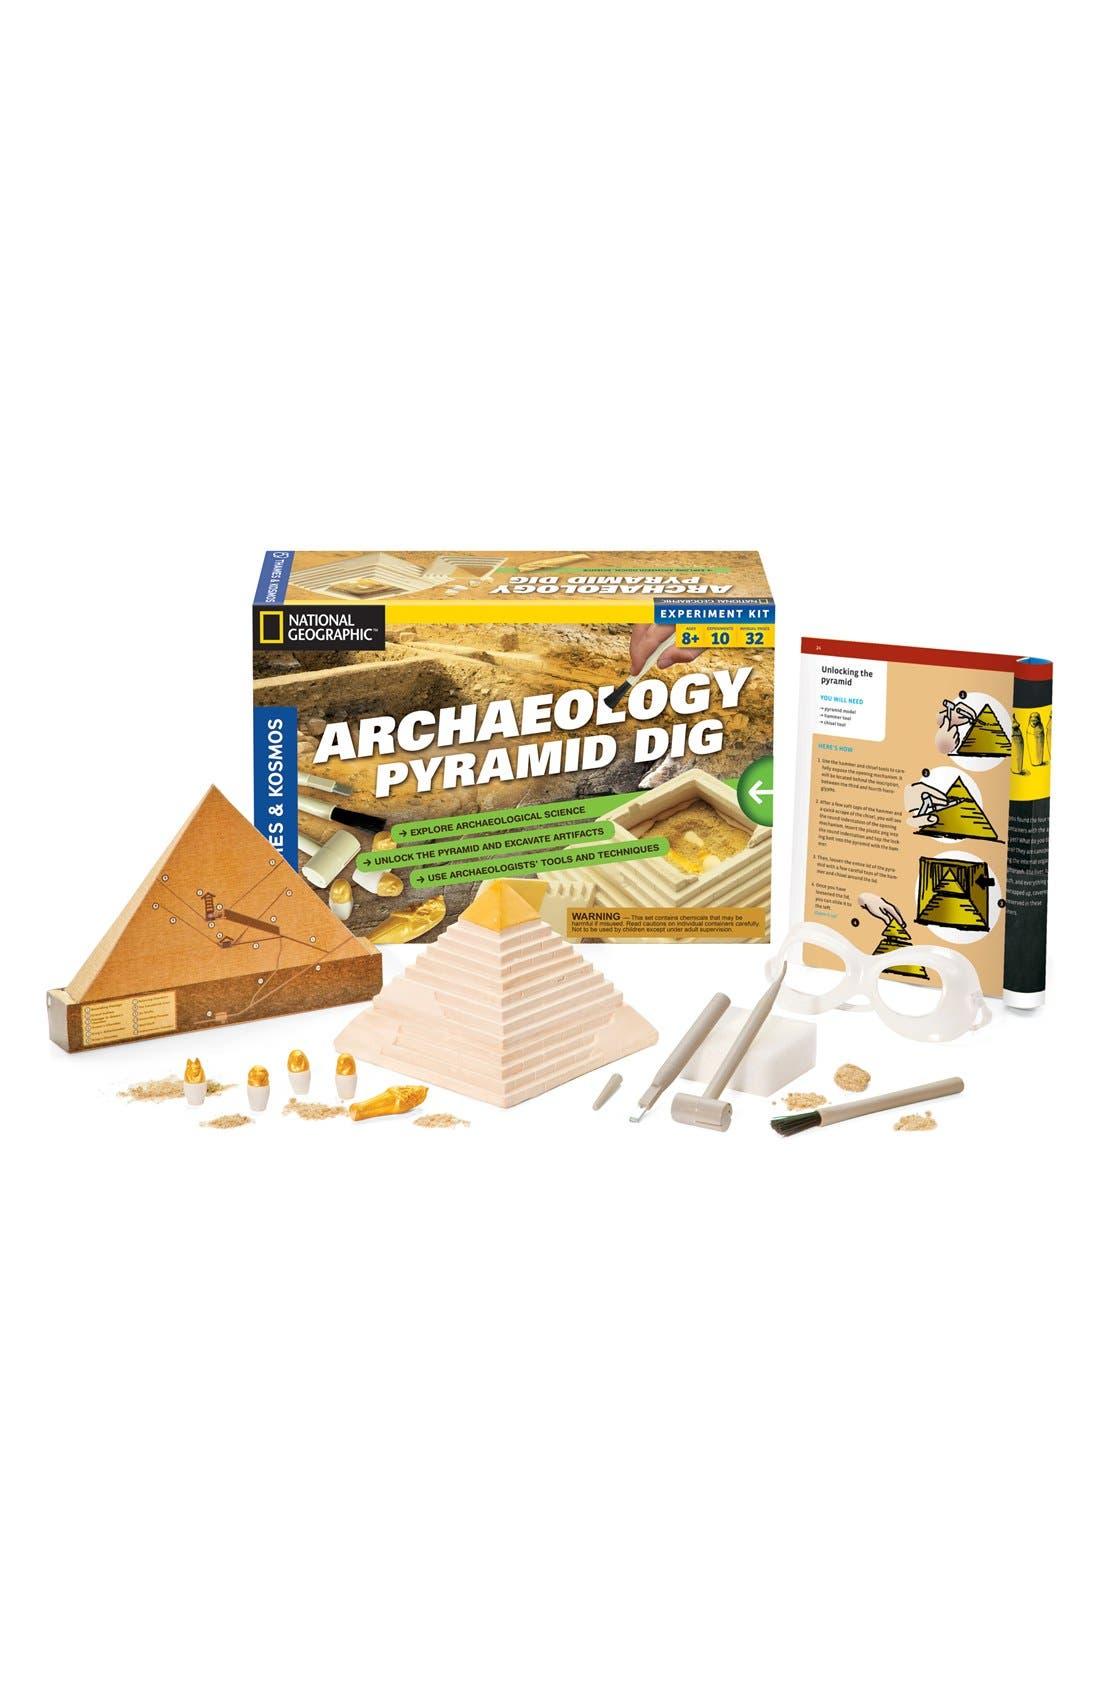 Thames & Kosmos 'Archaeology: Pyramid Dig 2.0' Play Kit